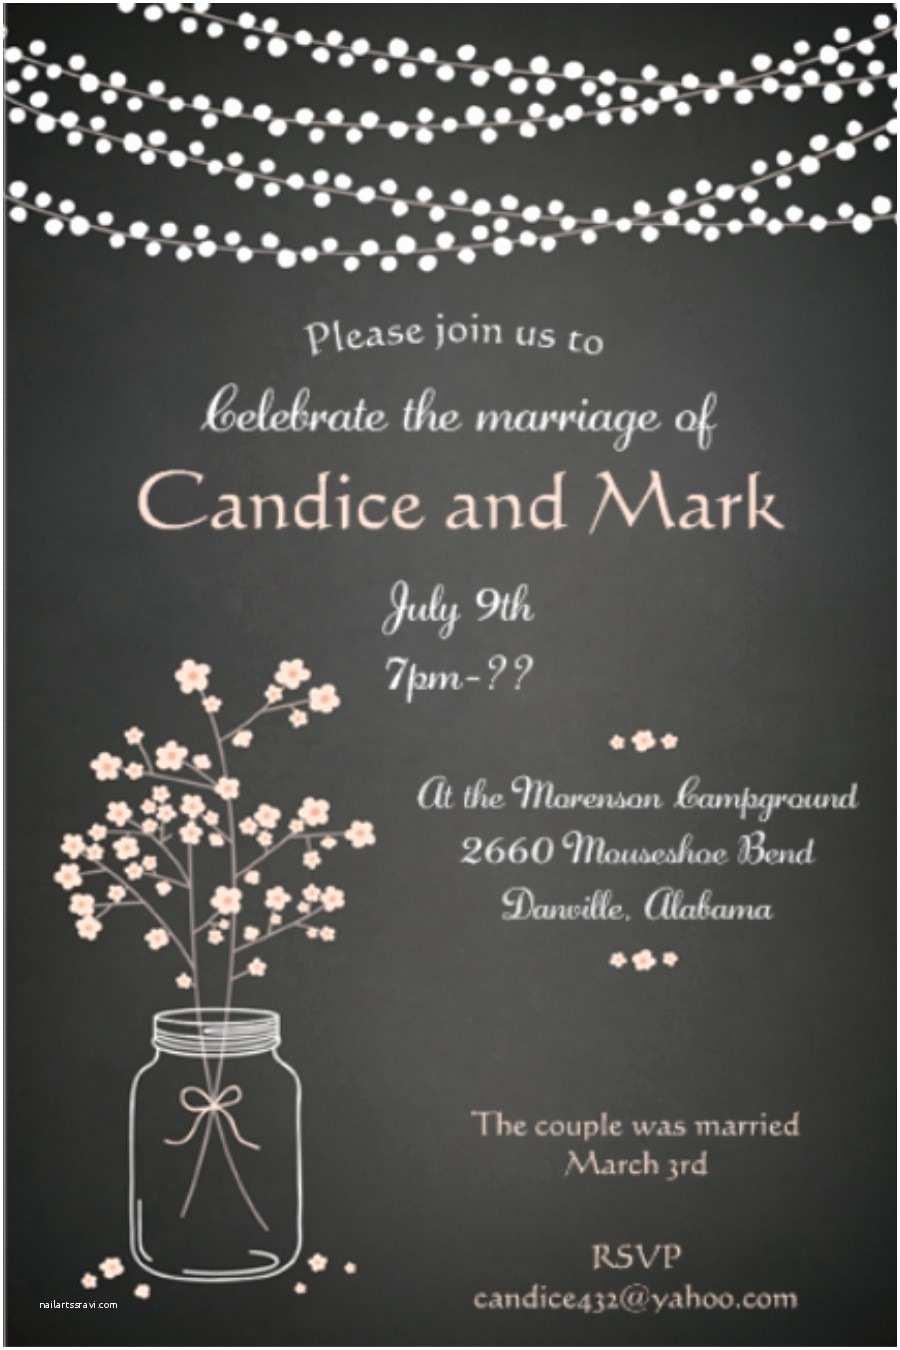 Rustic Wedding Invitations Under $1 Elopement Party Invitations Reception Ly Invitations